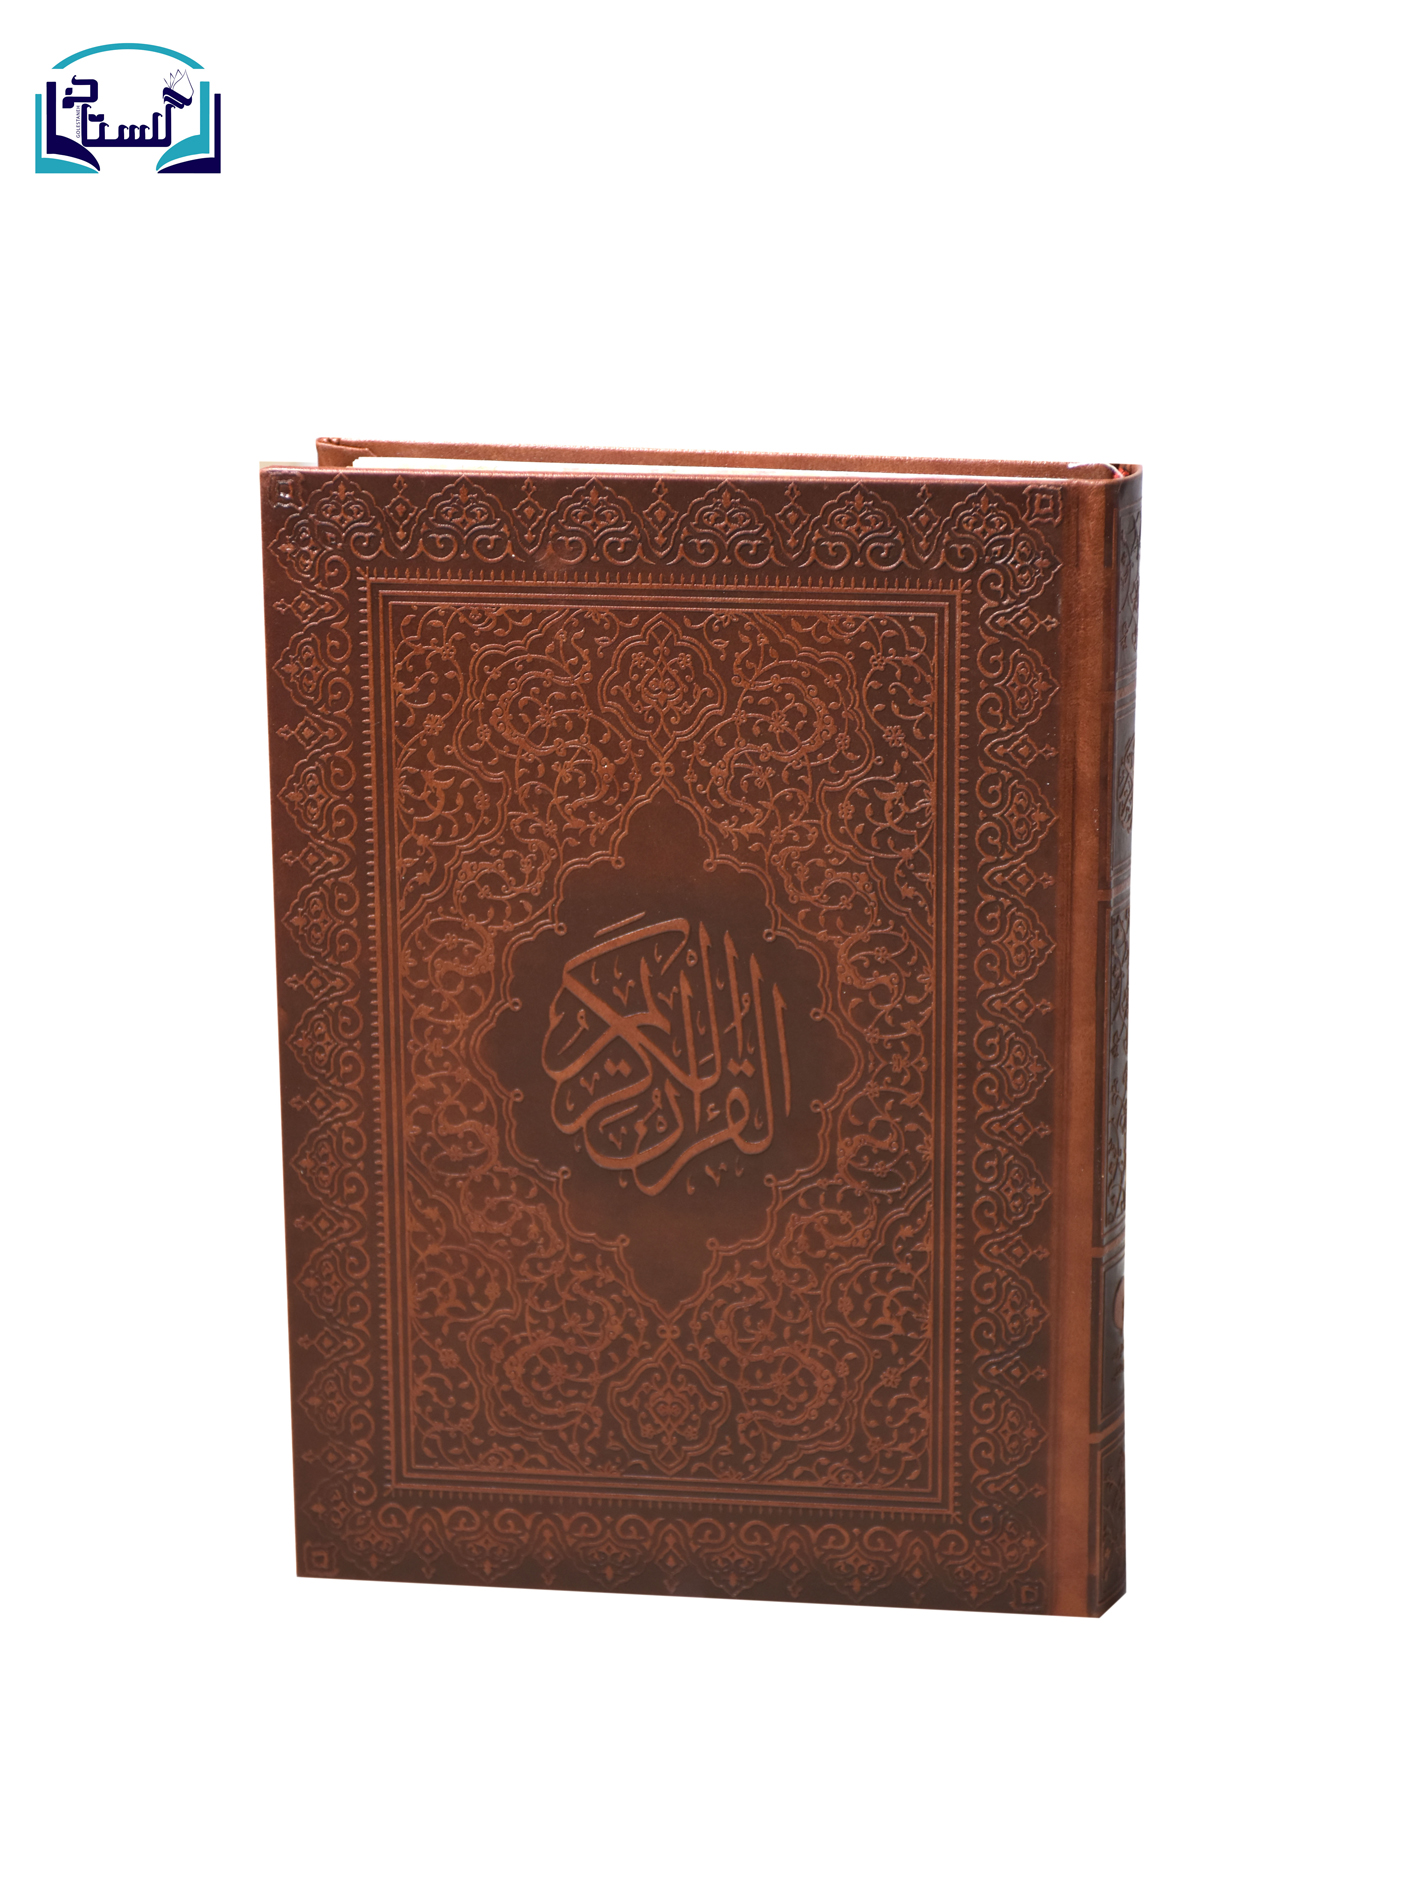 =قرآن-(آيين-دانش)-عثمان-طه-وزيري-چرم-انصاريان-چهار-رنگ